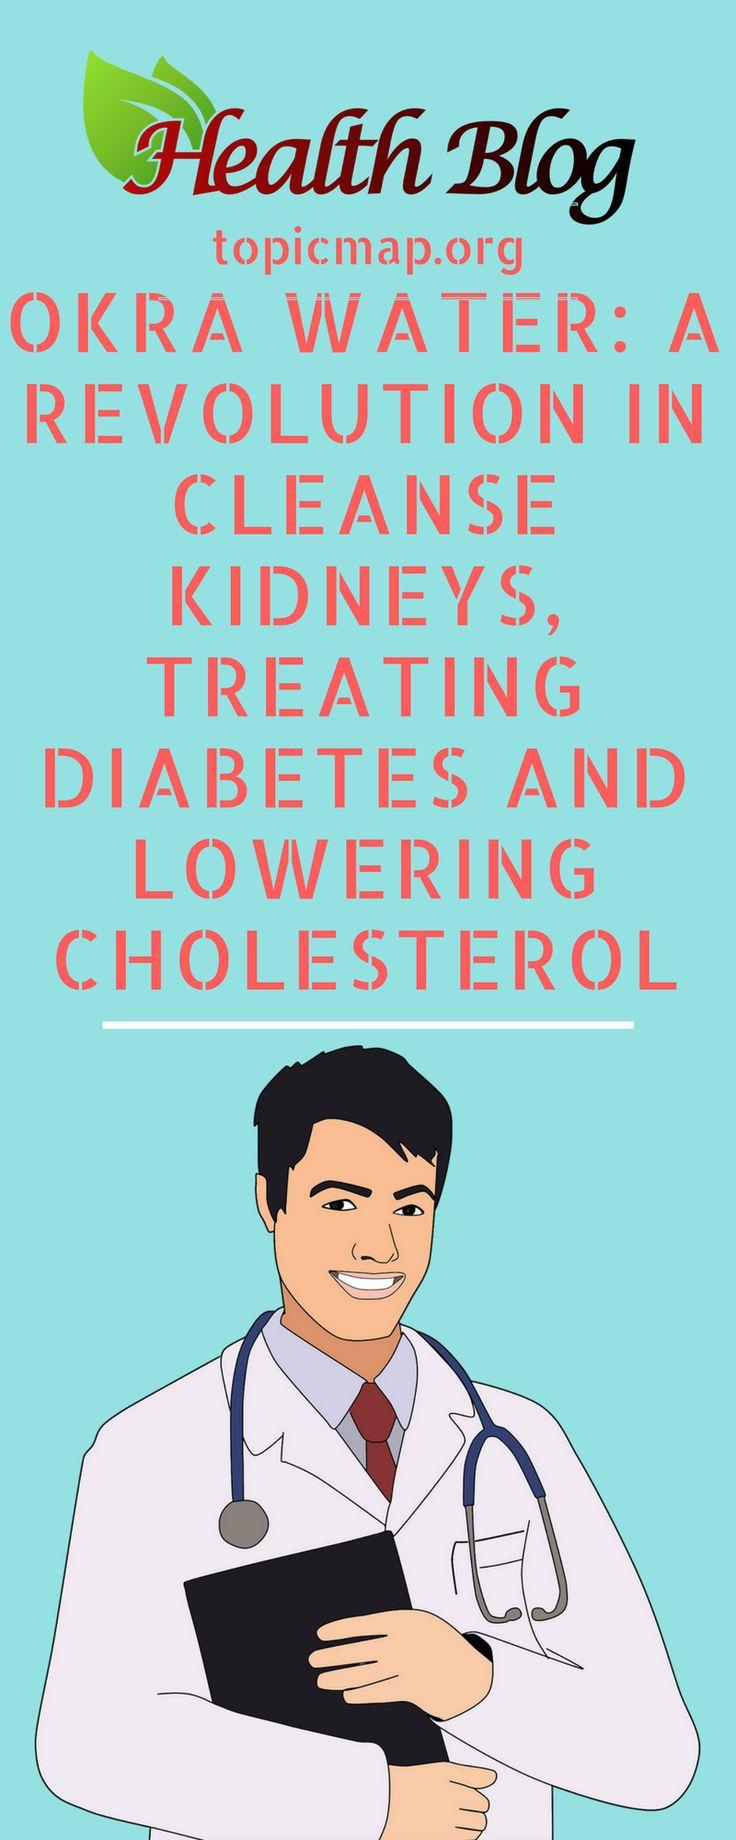 Okra Water: A Revolution In Cleanse Kidneys, Treating Diabetes And Lowering Cholesterol